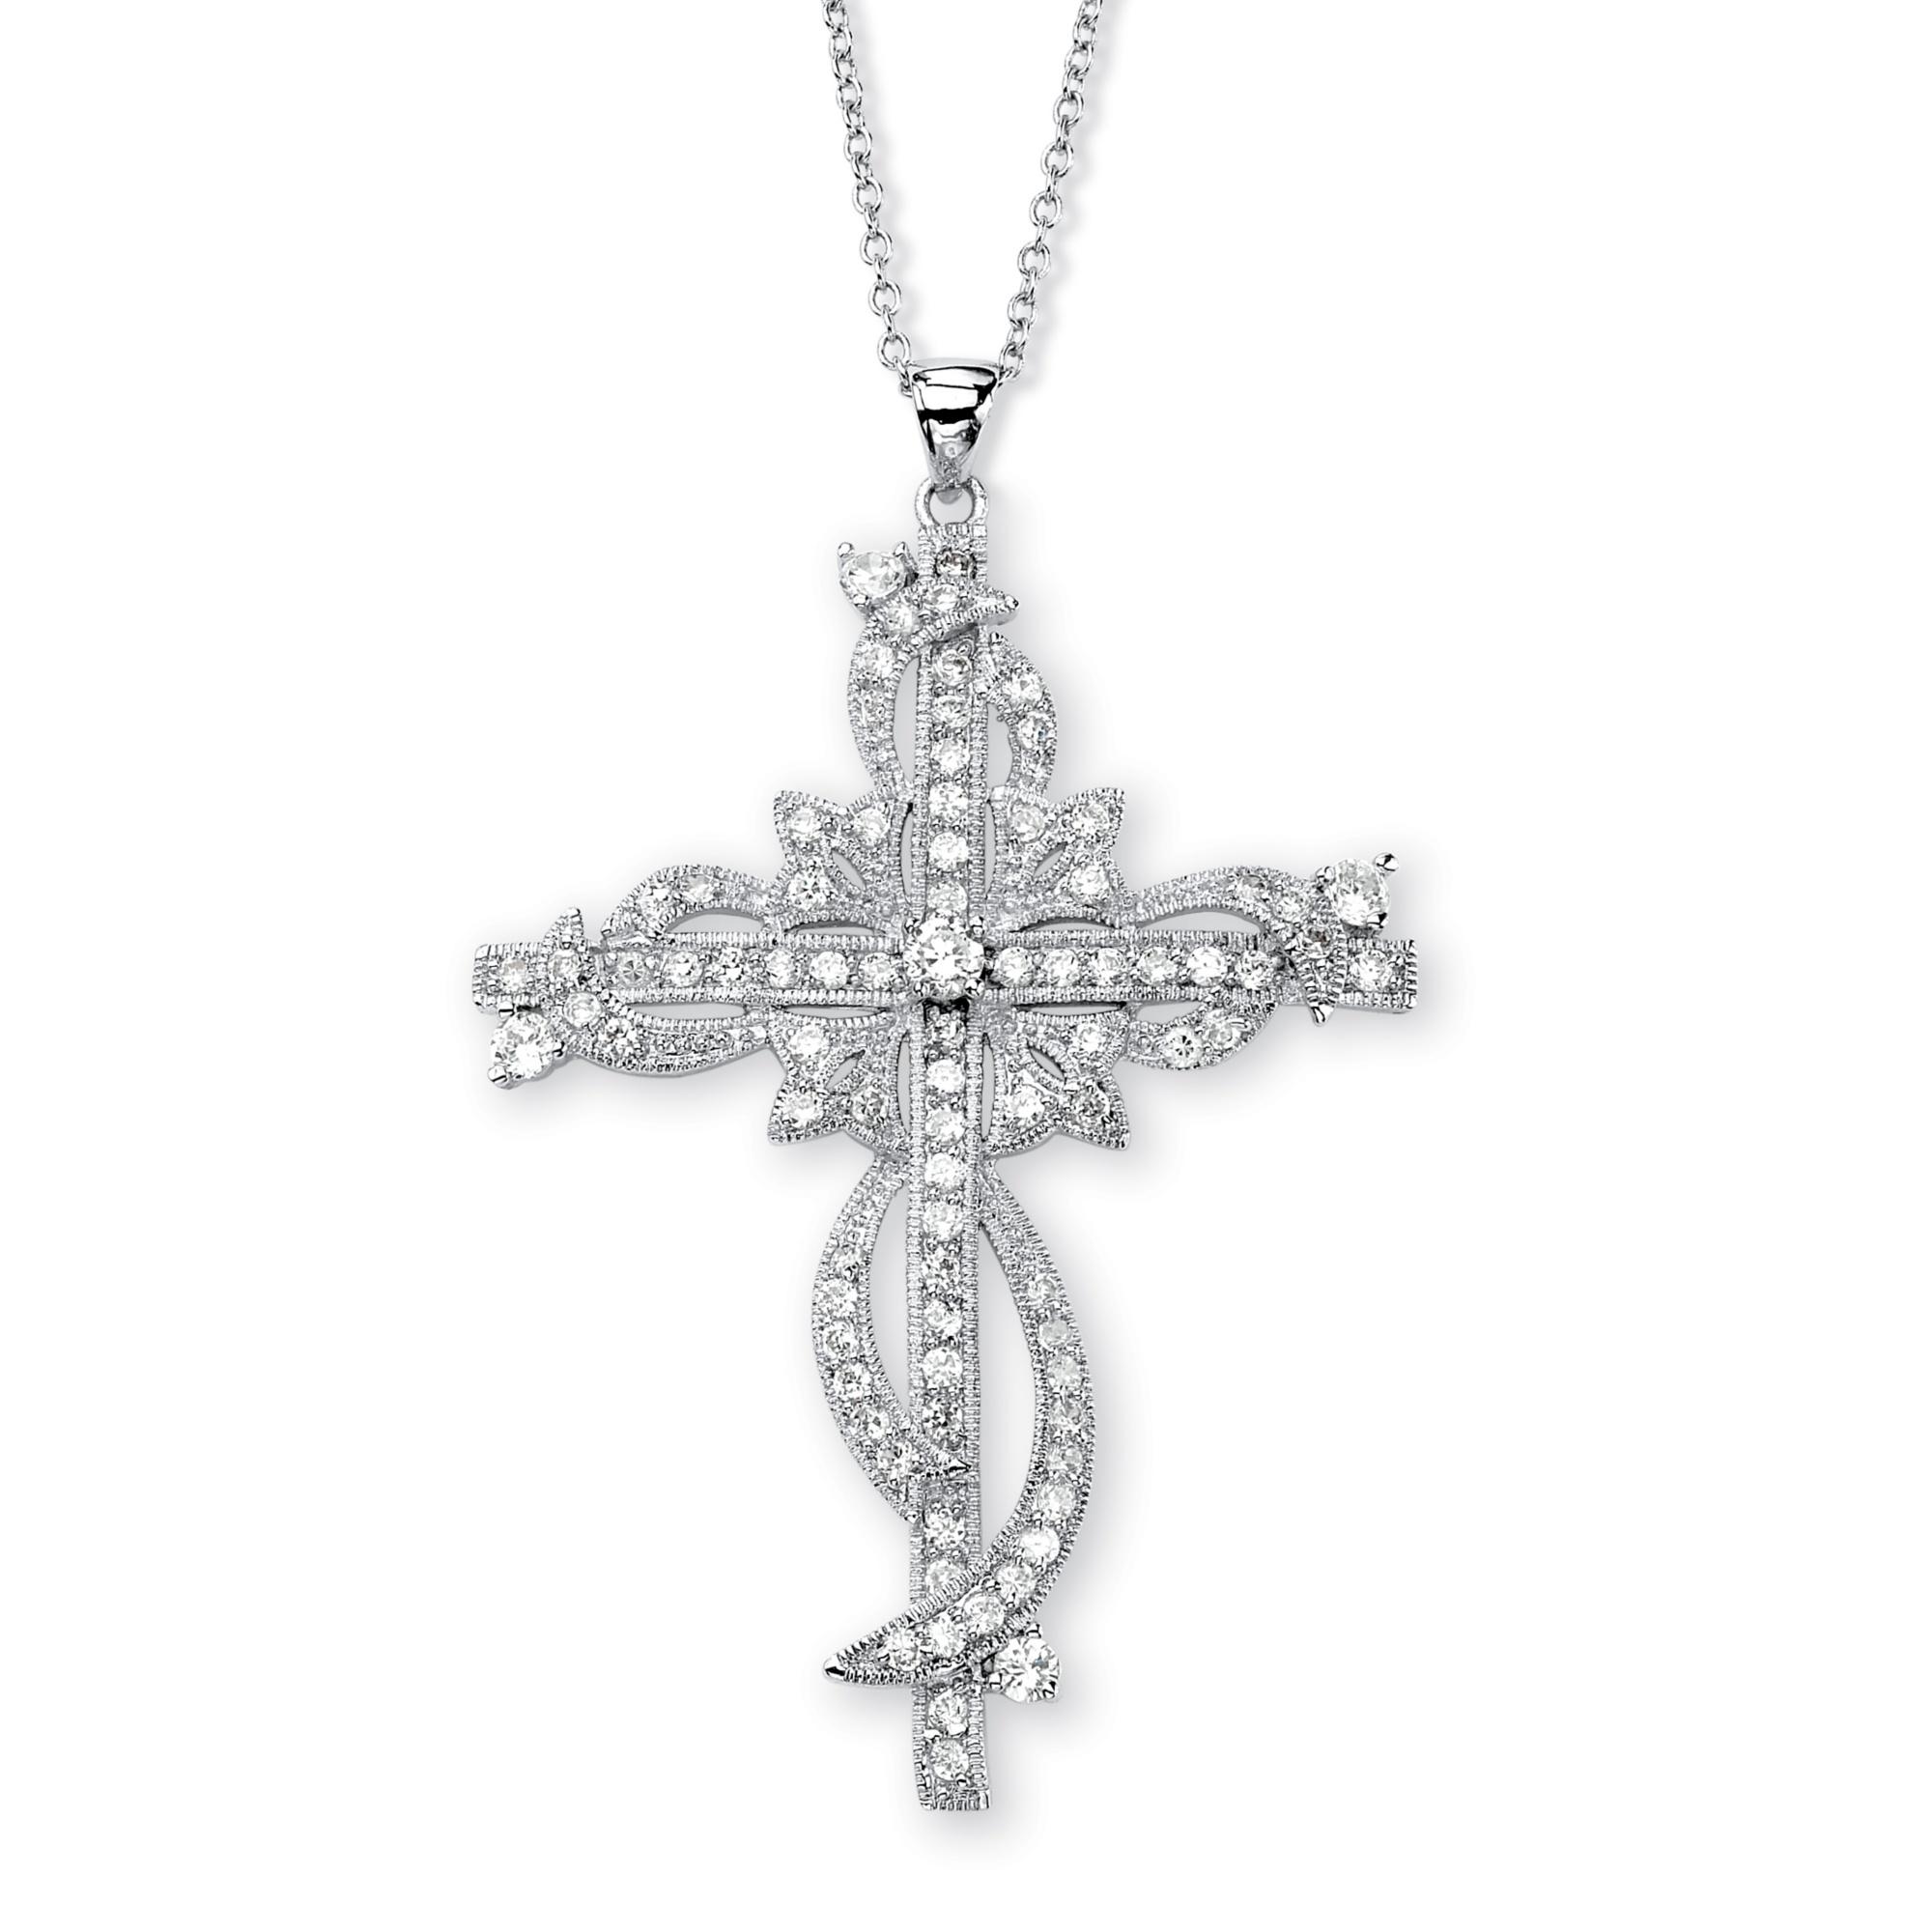 3.12 TCW Round Cubic Zirconia Cross Pendant Necklace in Silvertone 18